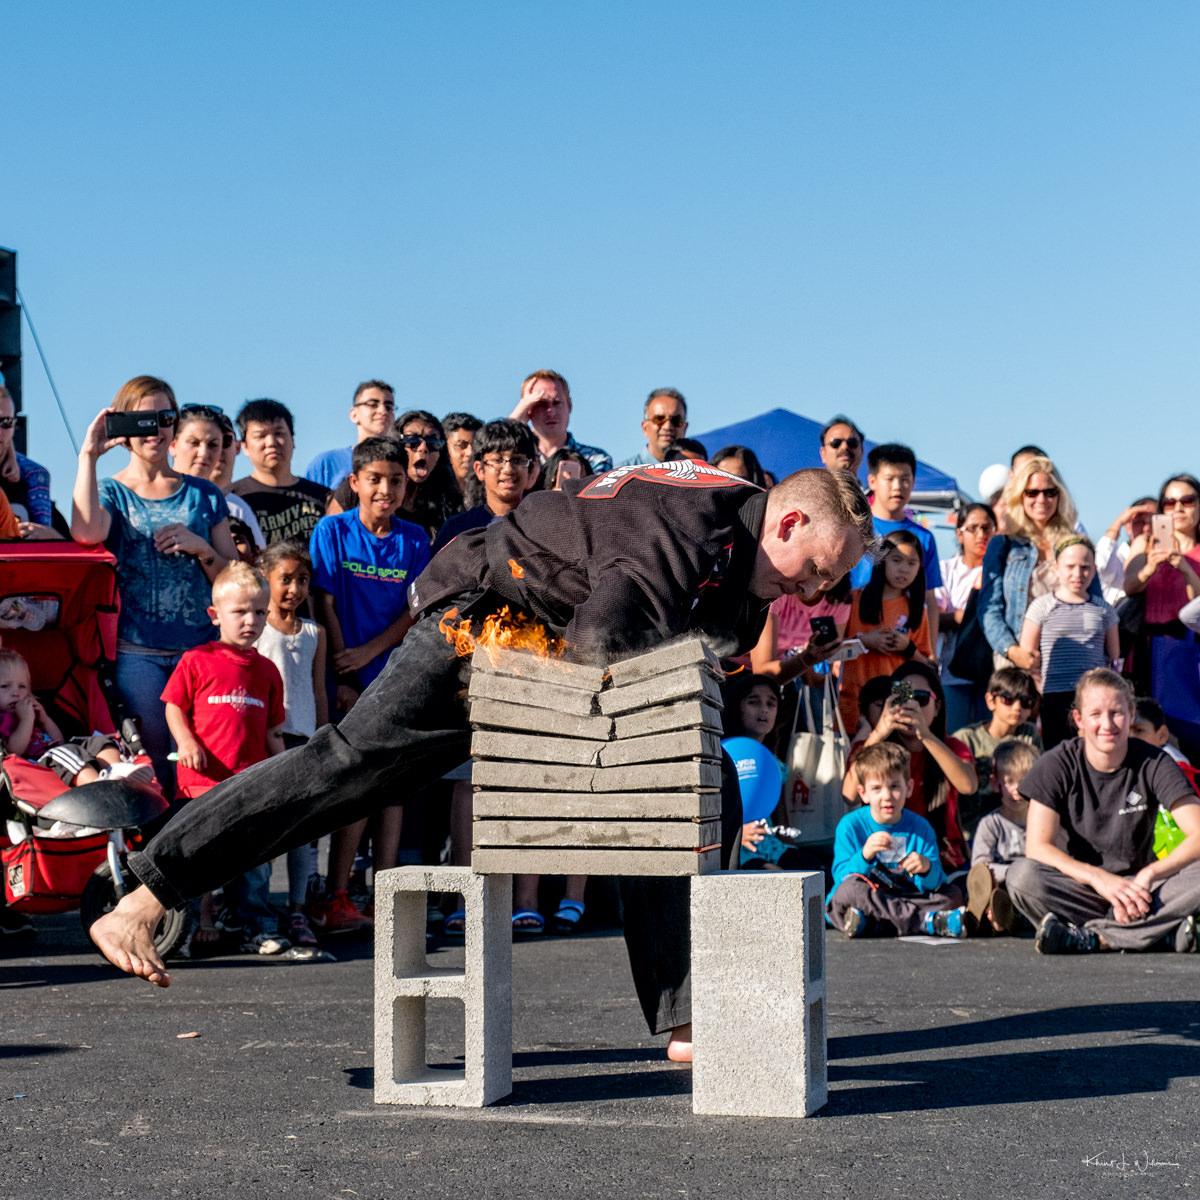 John Kanabay, 2016 ISKA World Breaking Champion 2016 Montgomery FunFest X T2 20160925 0939 Edit blog